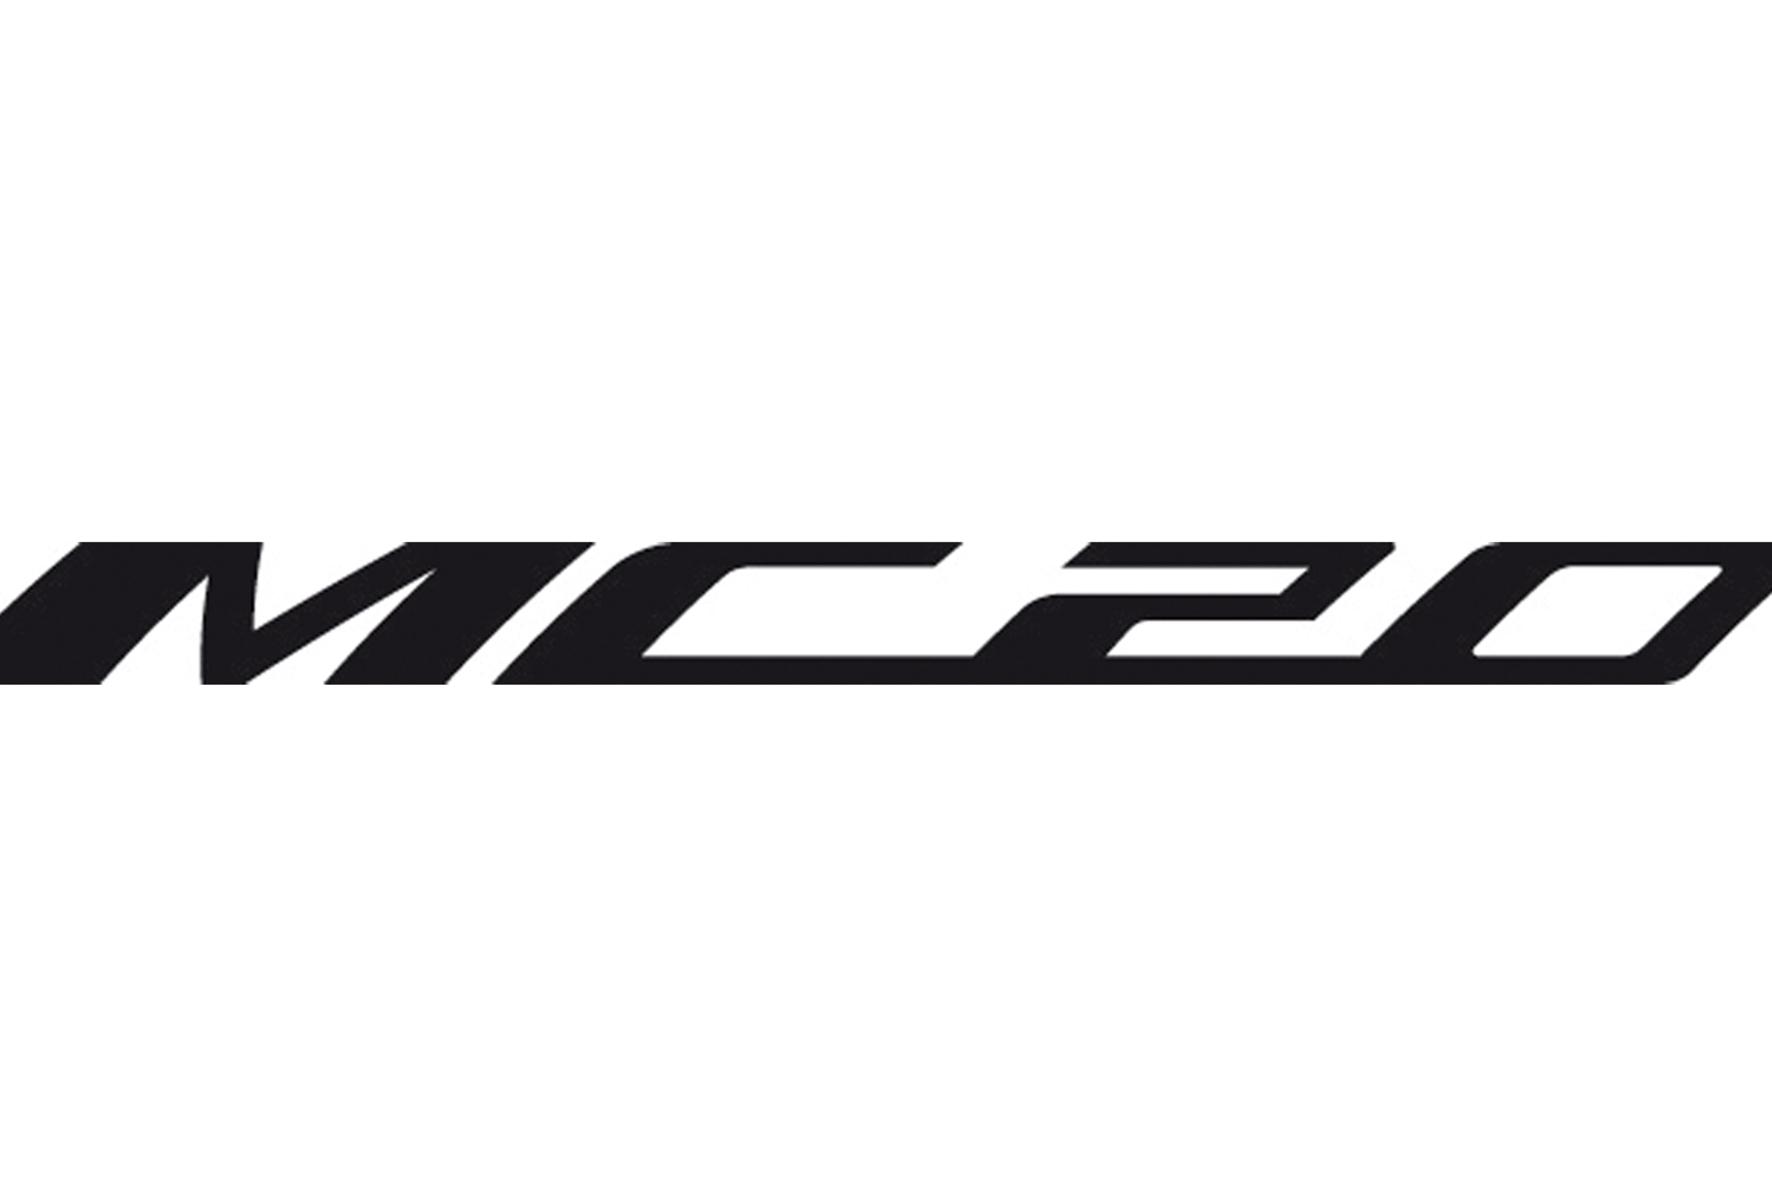 mid Groß-Gerau - Maserati präsentiert den MC20 im Mai 2020. Maserati